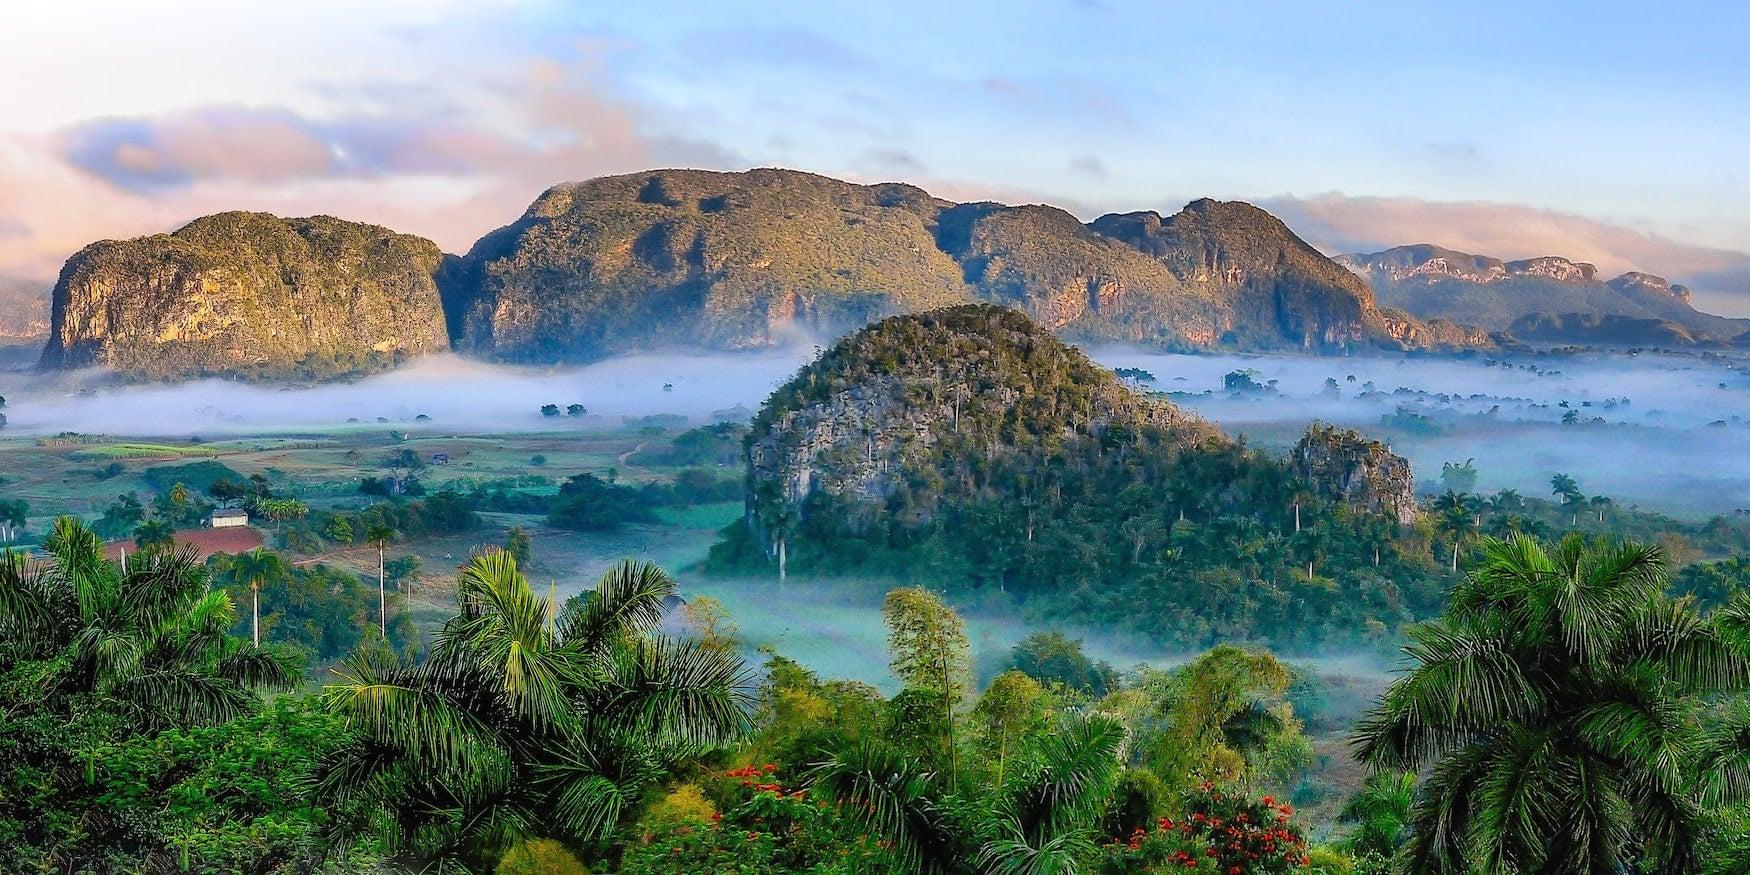 Blick auf die markanten Felsen im Viñales-Tal auf Kuba